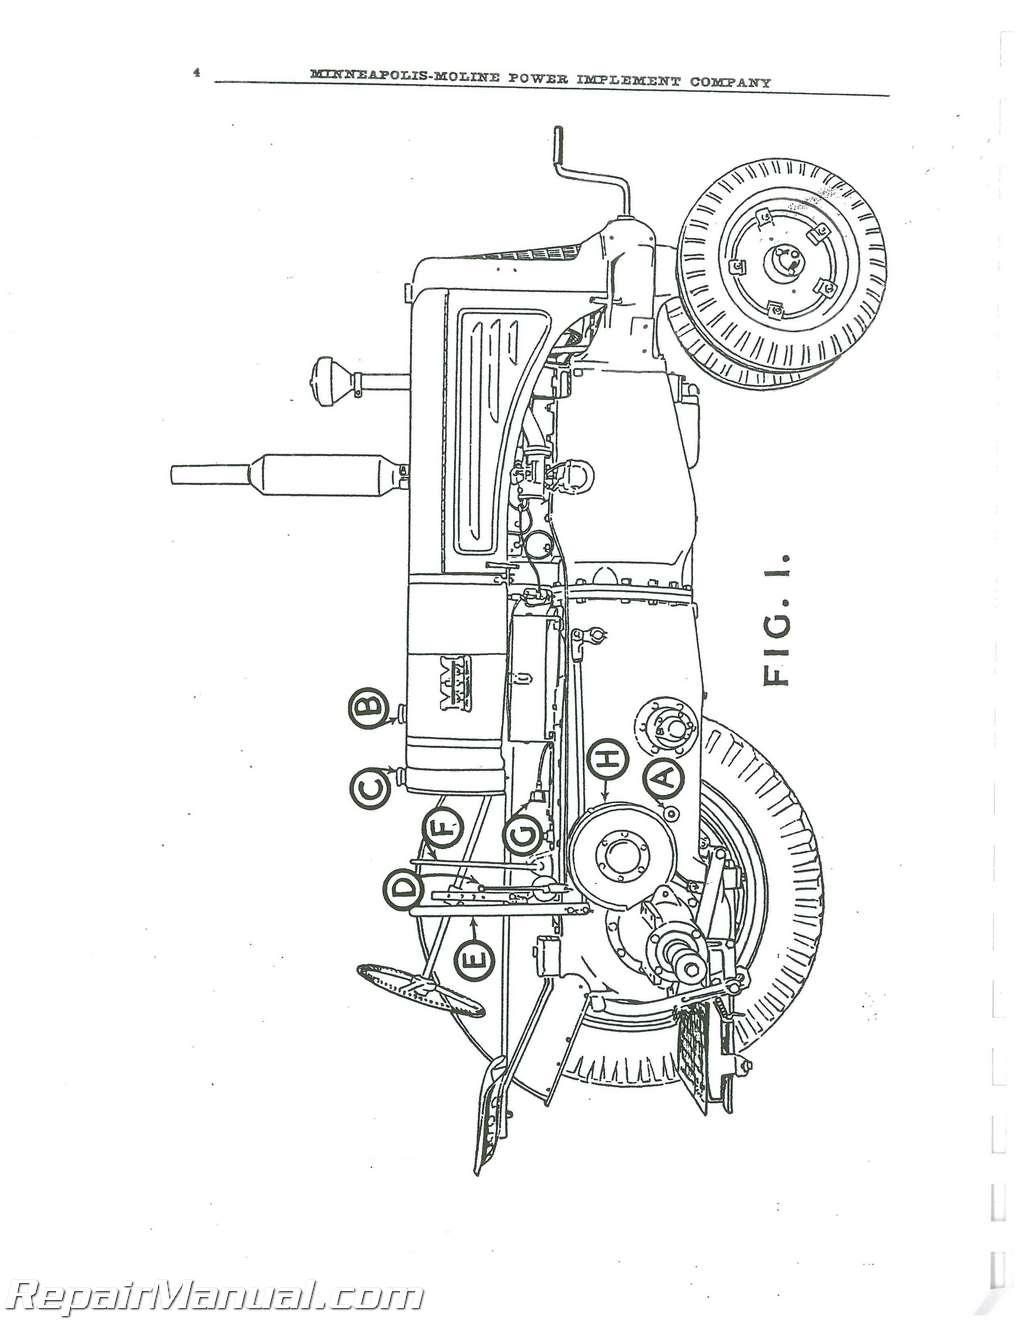 minneapolis moline universal z 1938 to 1948 service manual